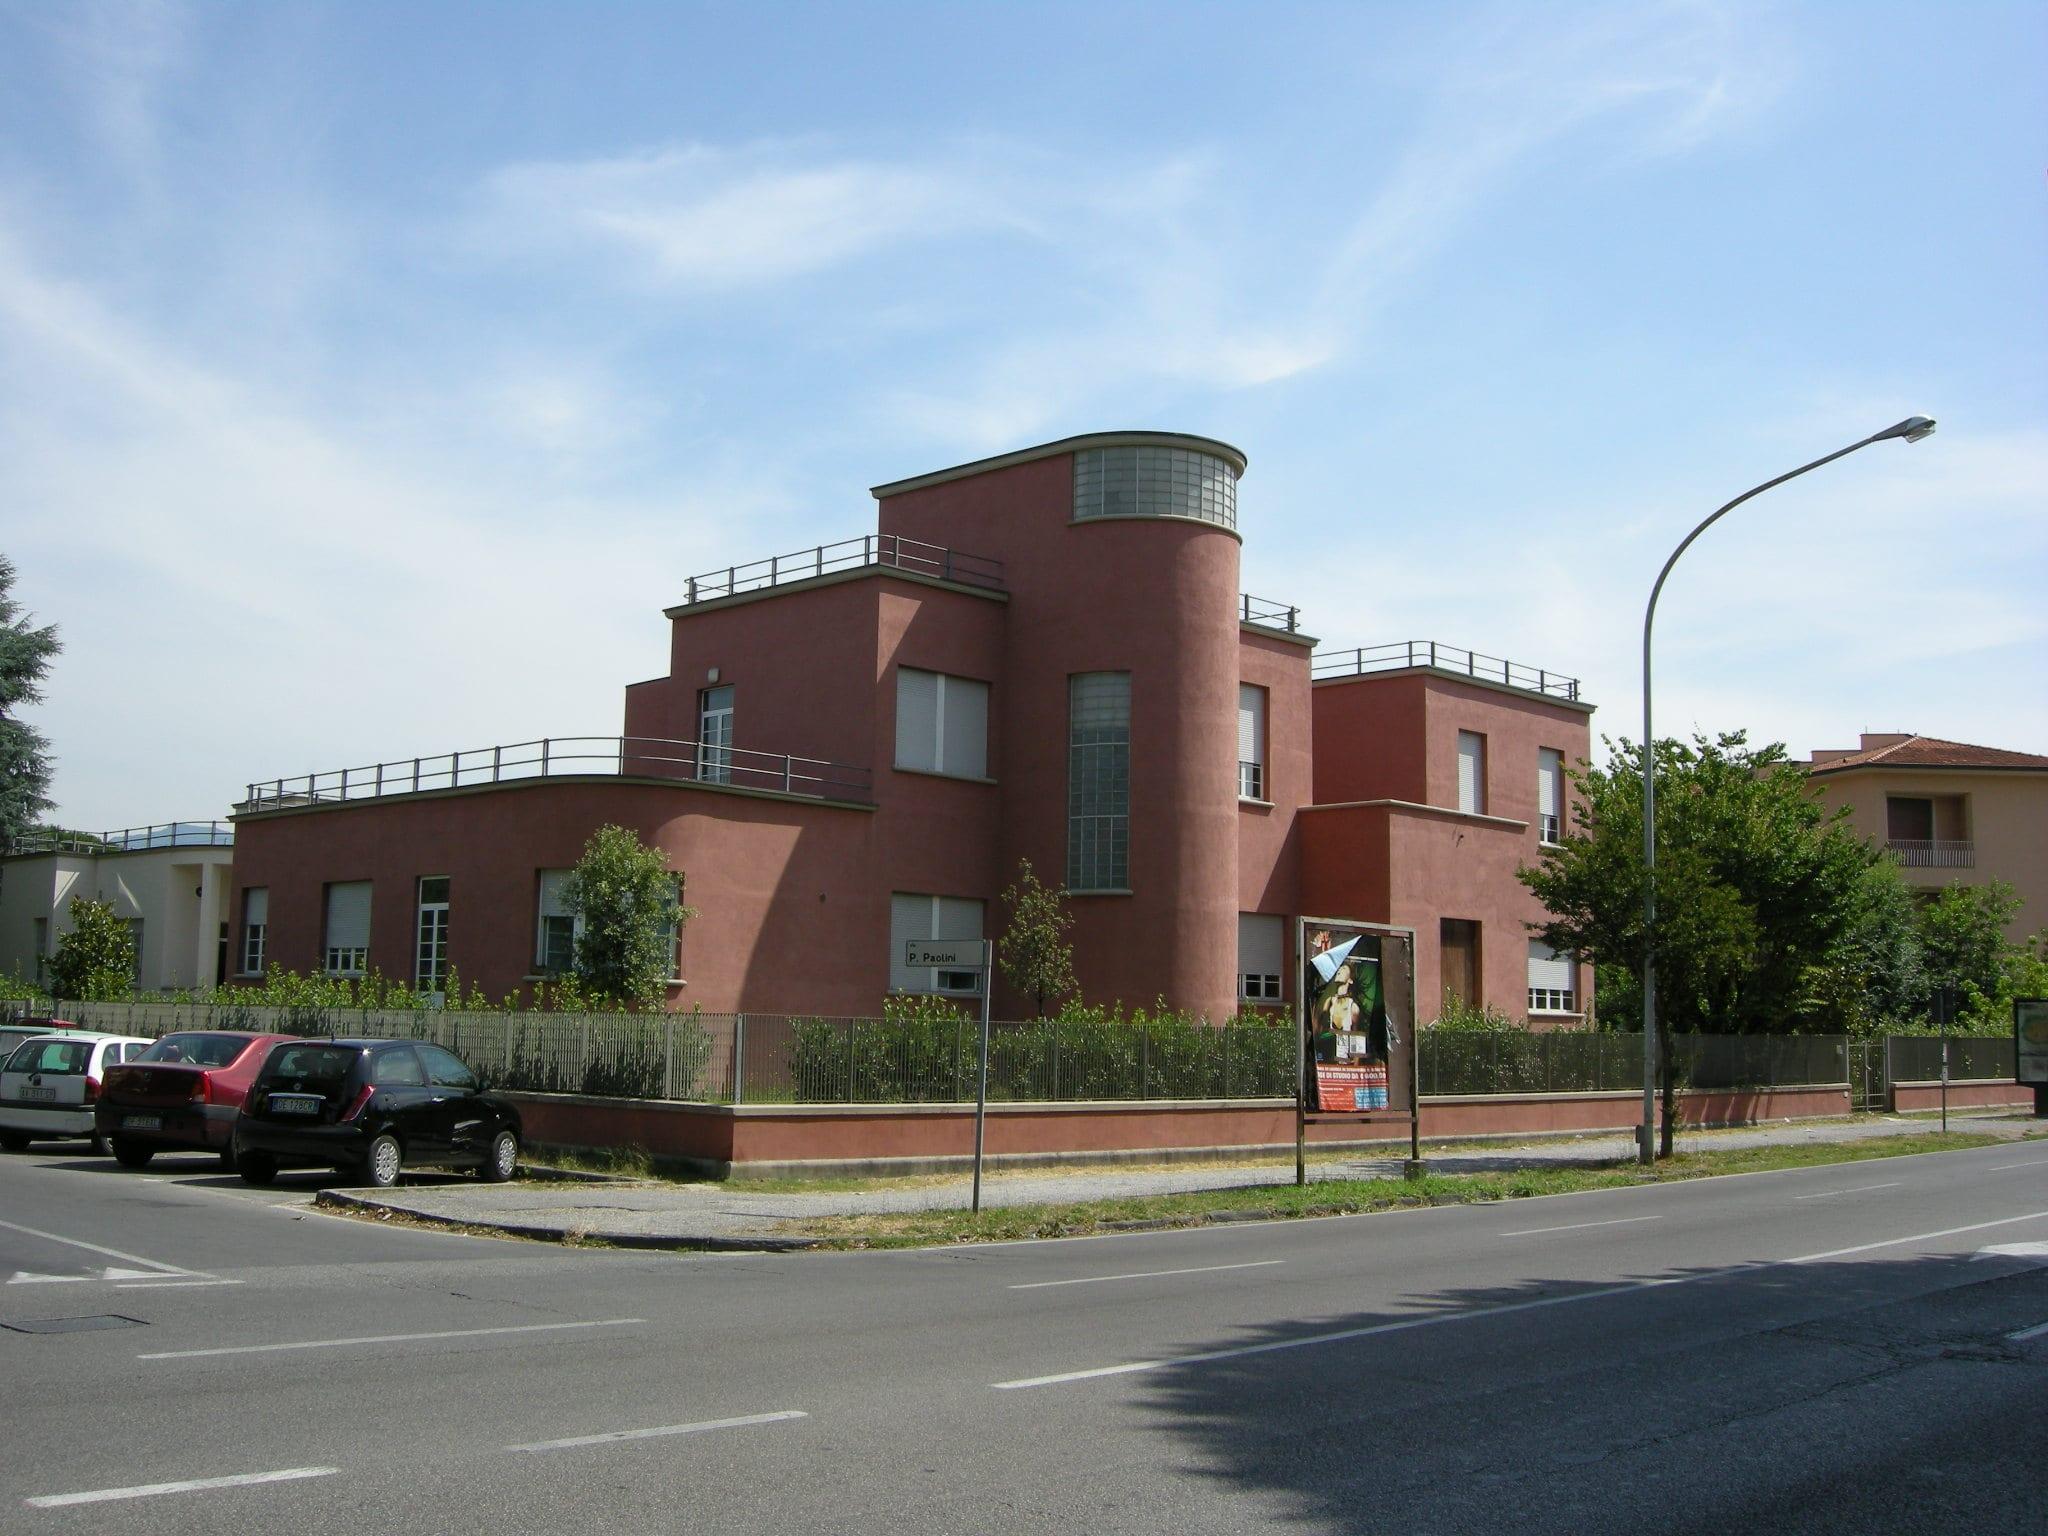 Palazzina Usl di Lucca